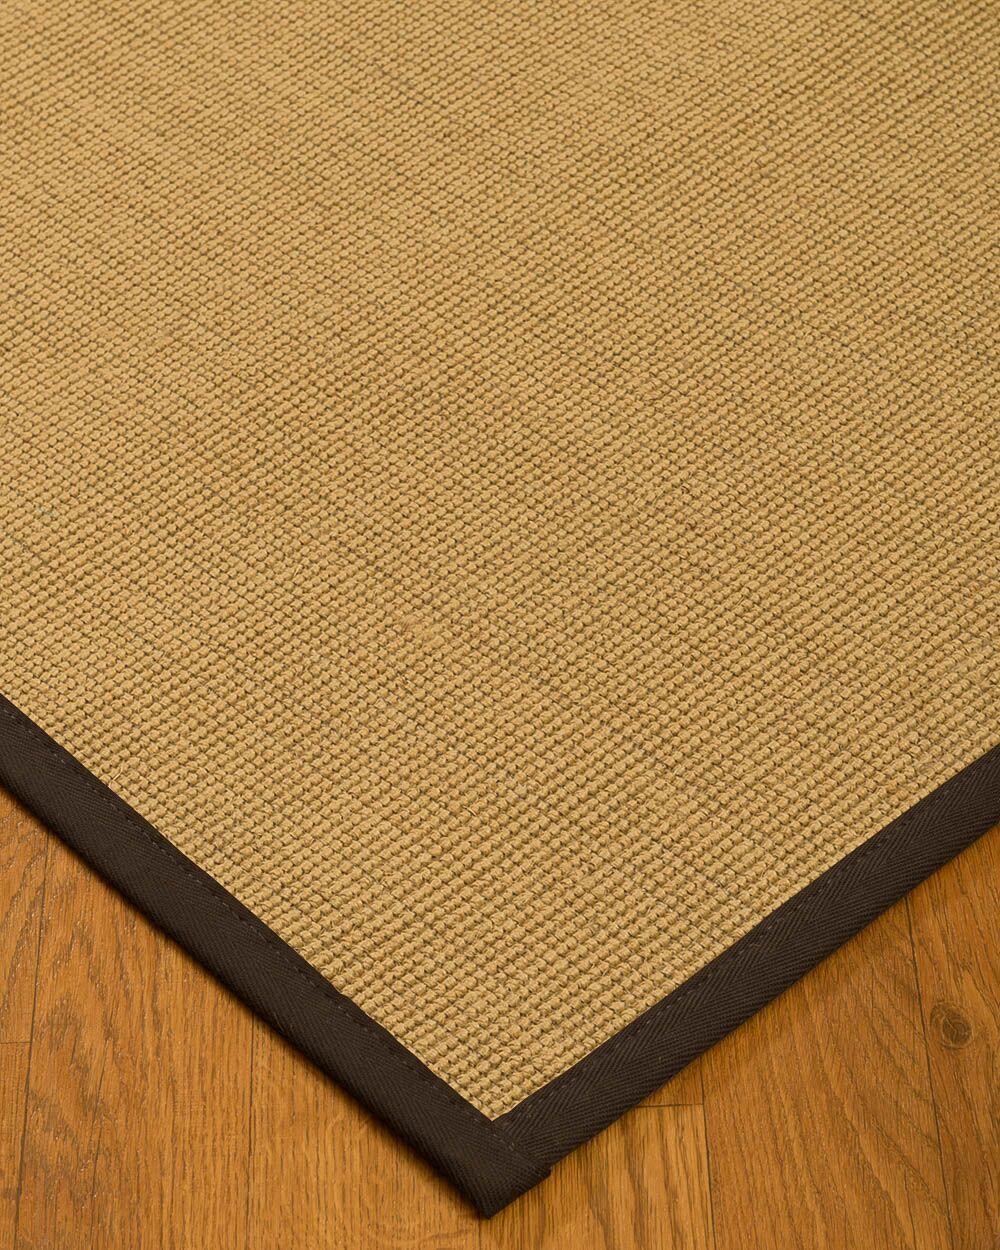 Lanie Hand Woven Fiber Sisal Brown/Fudge Area Rug Rug Size: Rectangle 12' x 15'